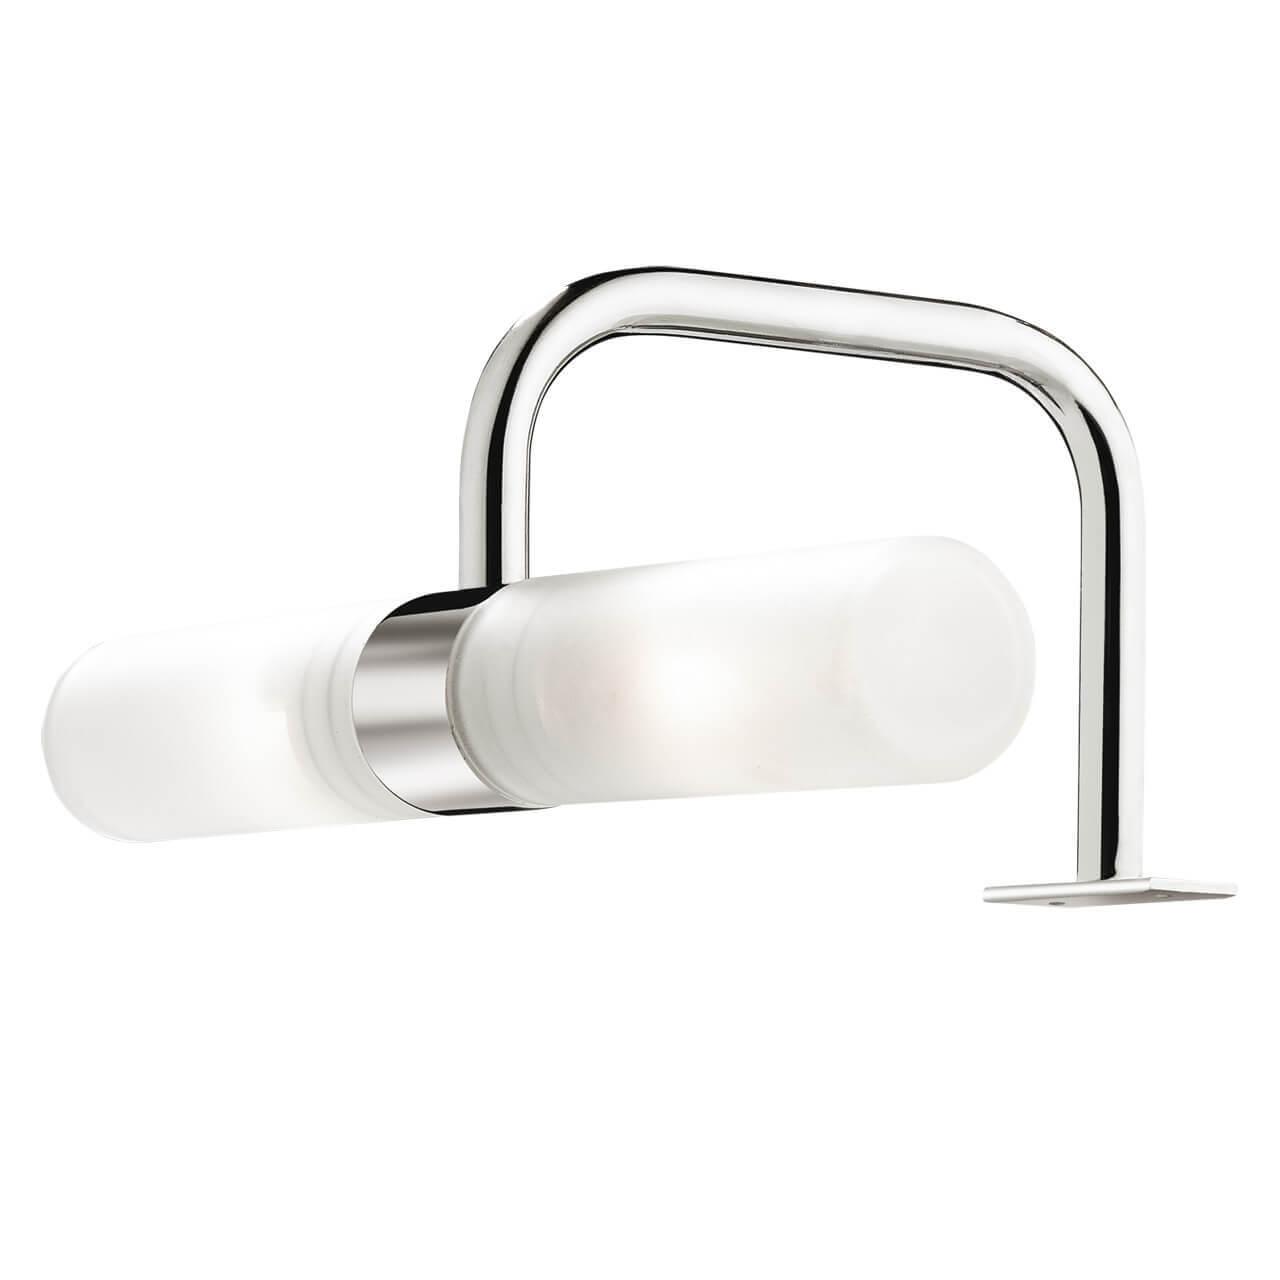 Подсветка для зеркал Odeon Light 2445/2 Drops